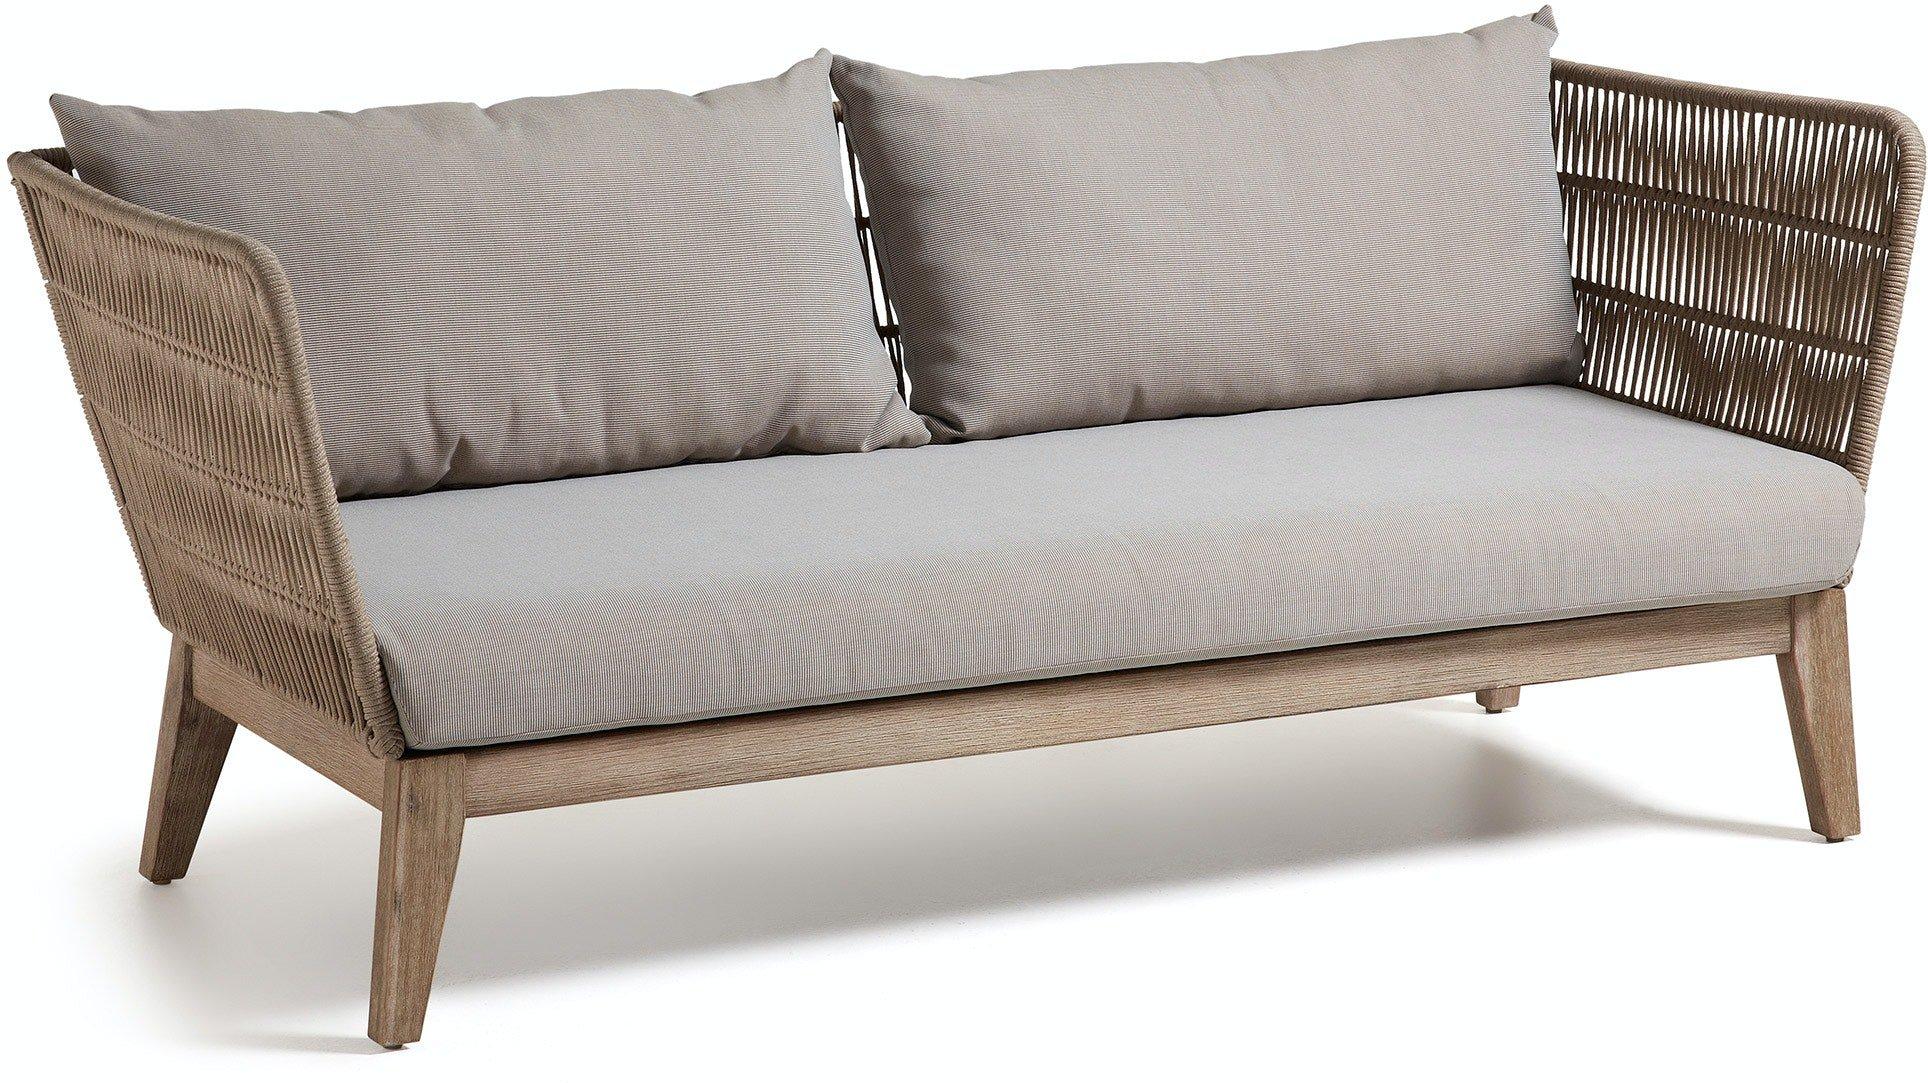 Belleny, Udendørs 3-personers sofa by LaForma (H: 70 cm. B: 176 cm. L: 80 cm., Beige/natur/grå)